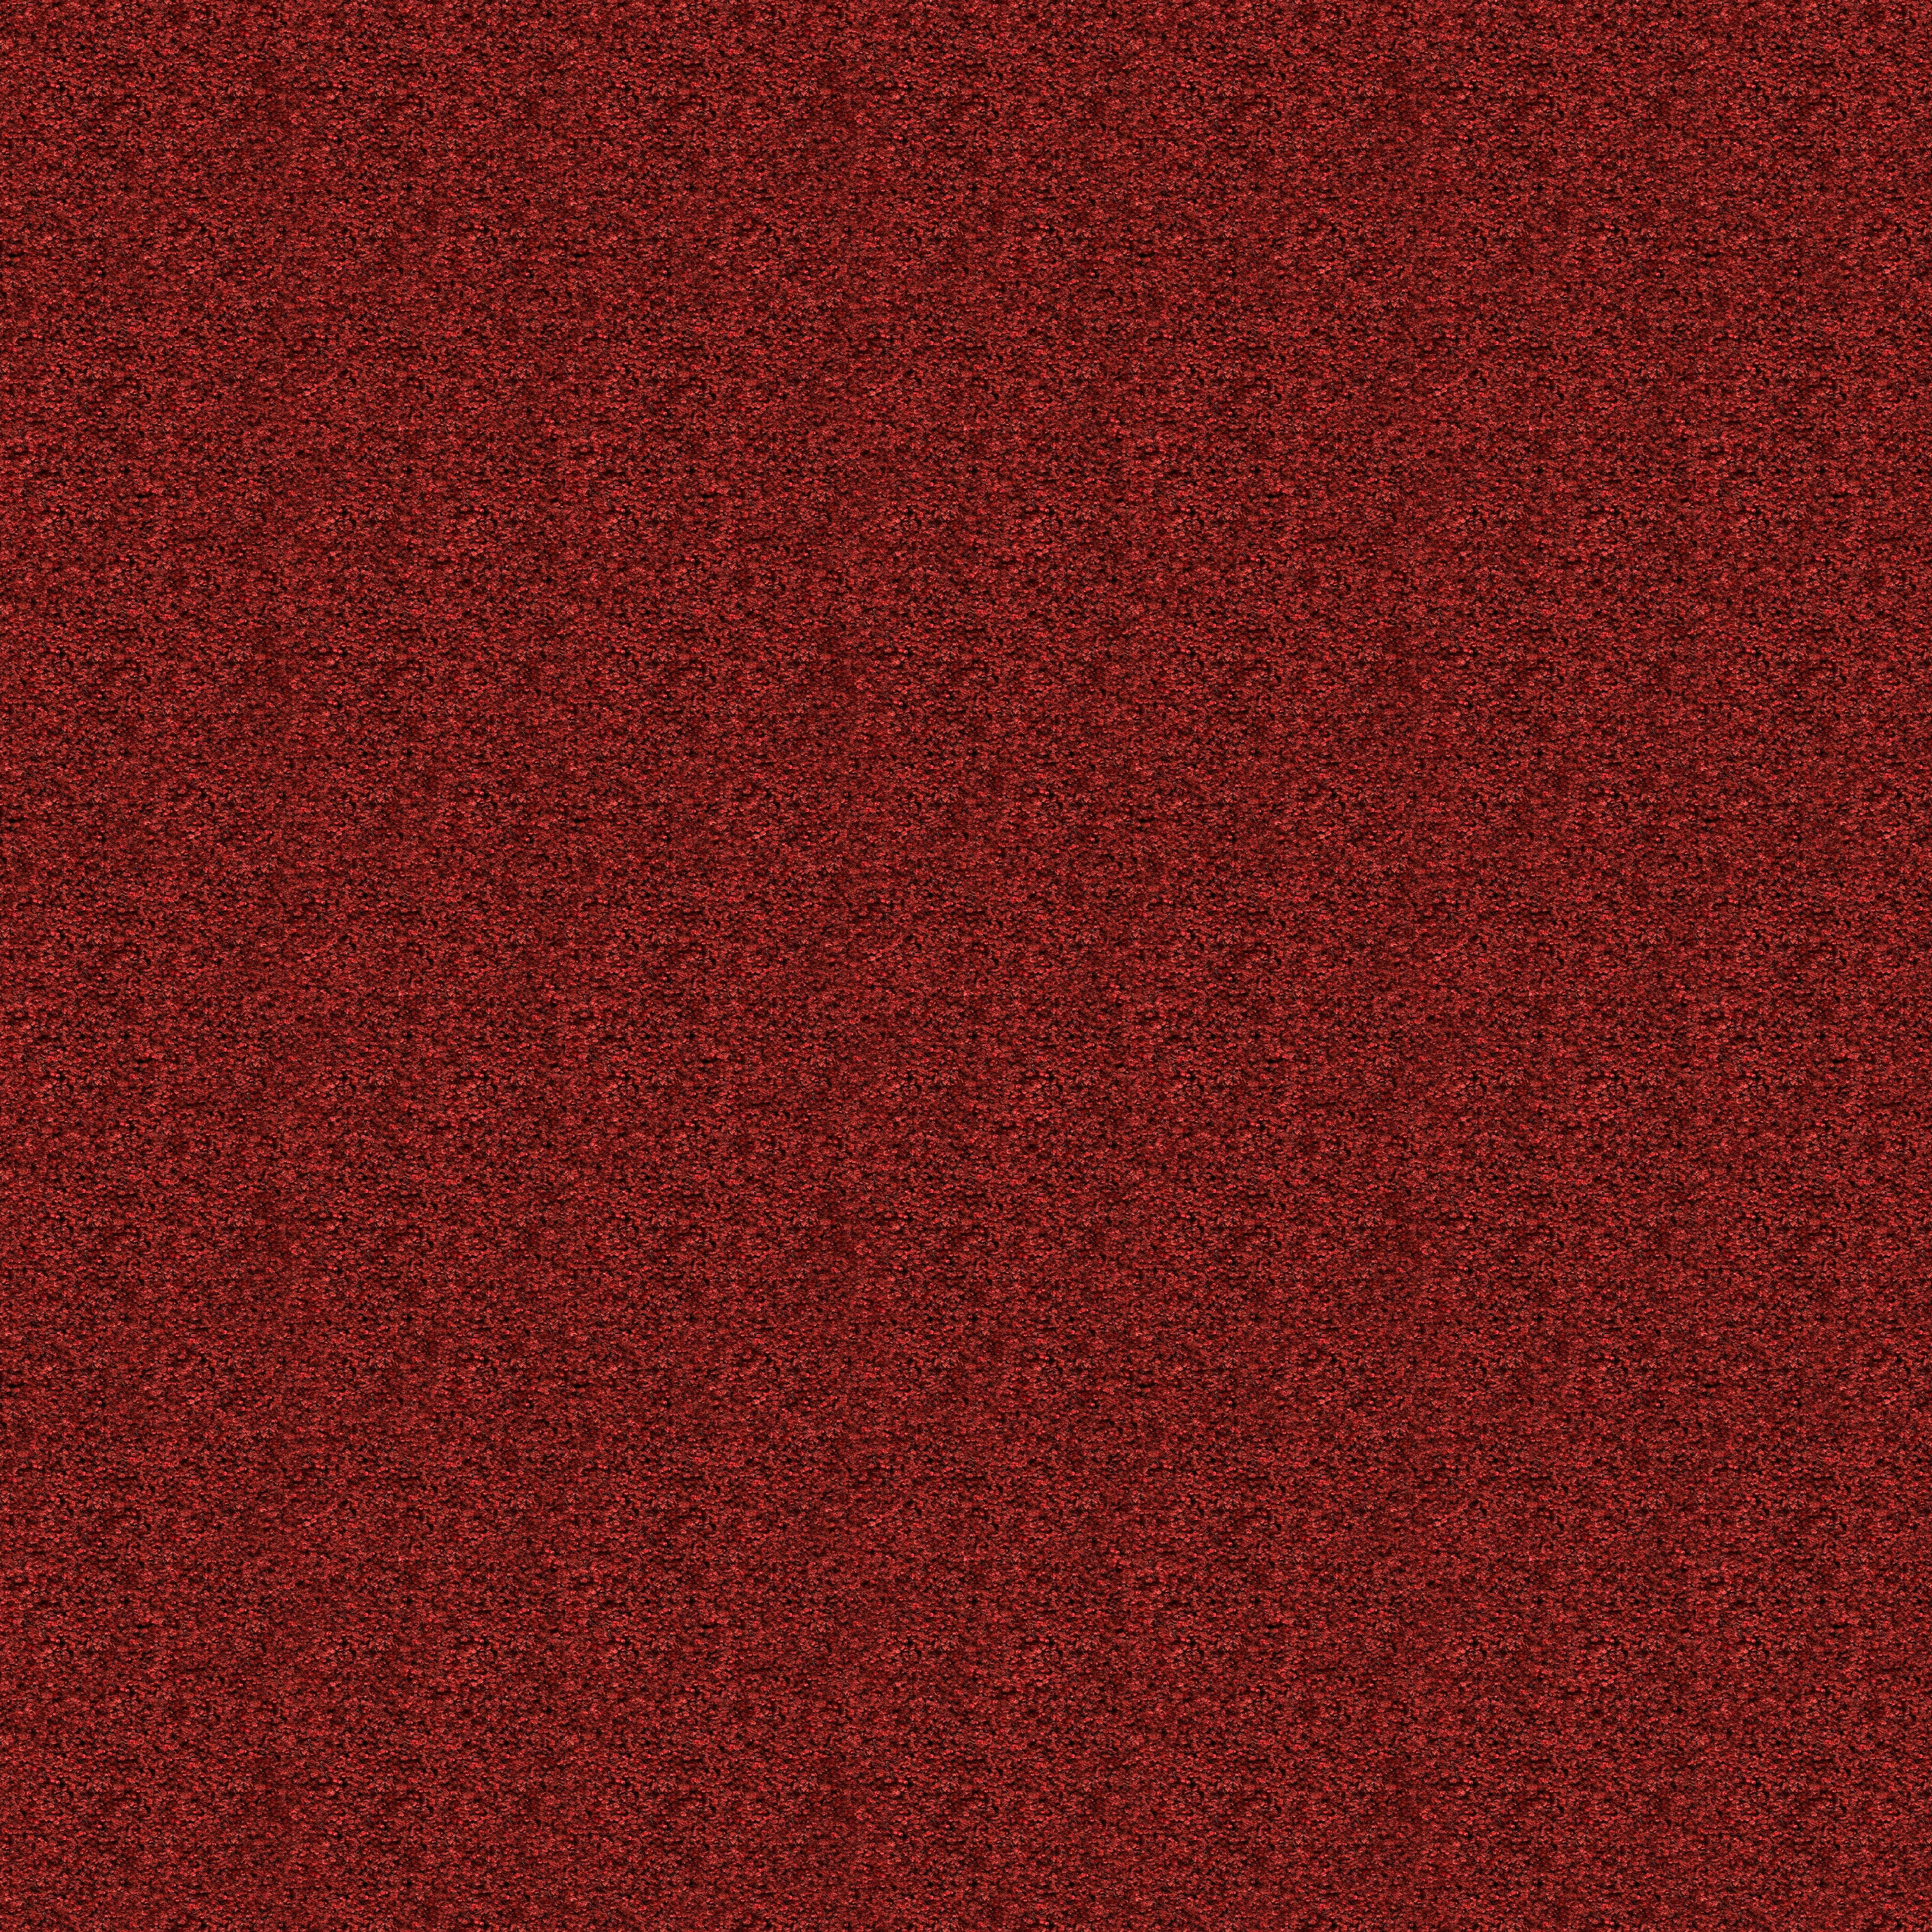 15 red carpet textures carpet textures freecreatives